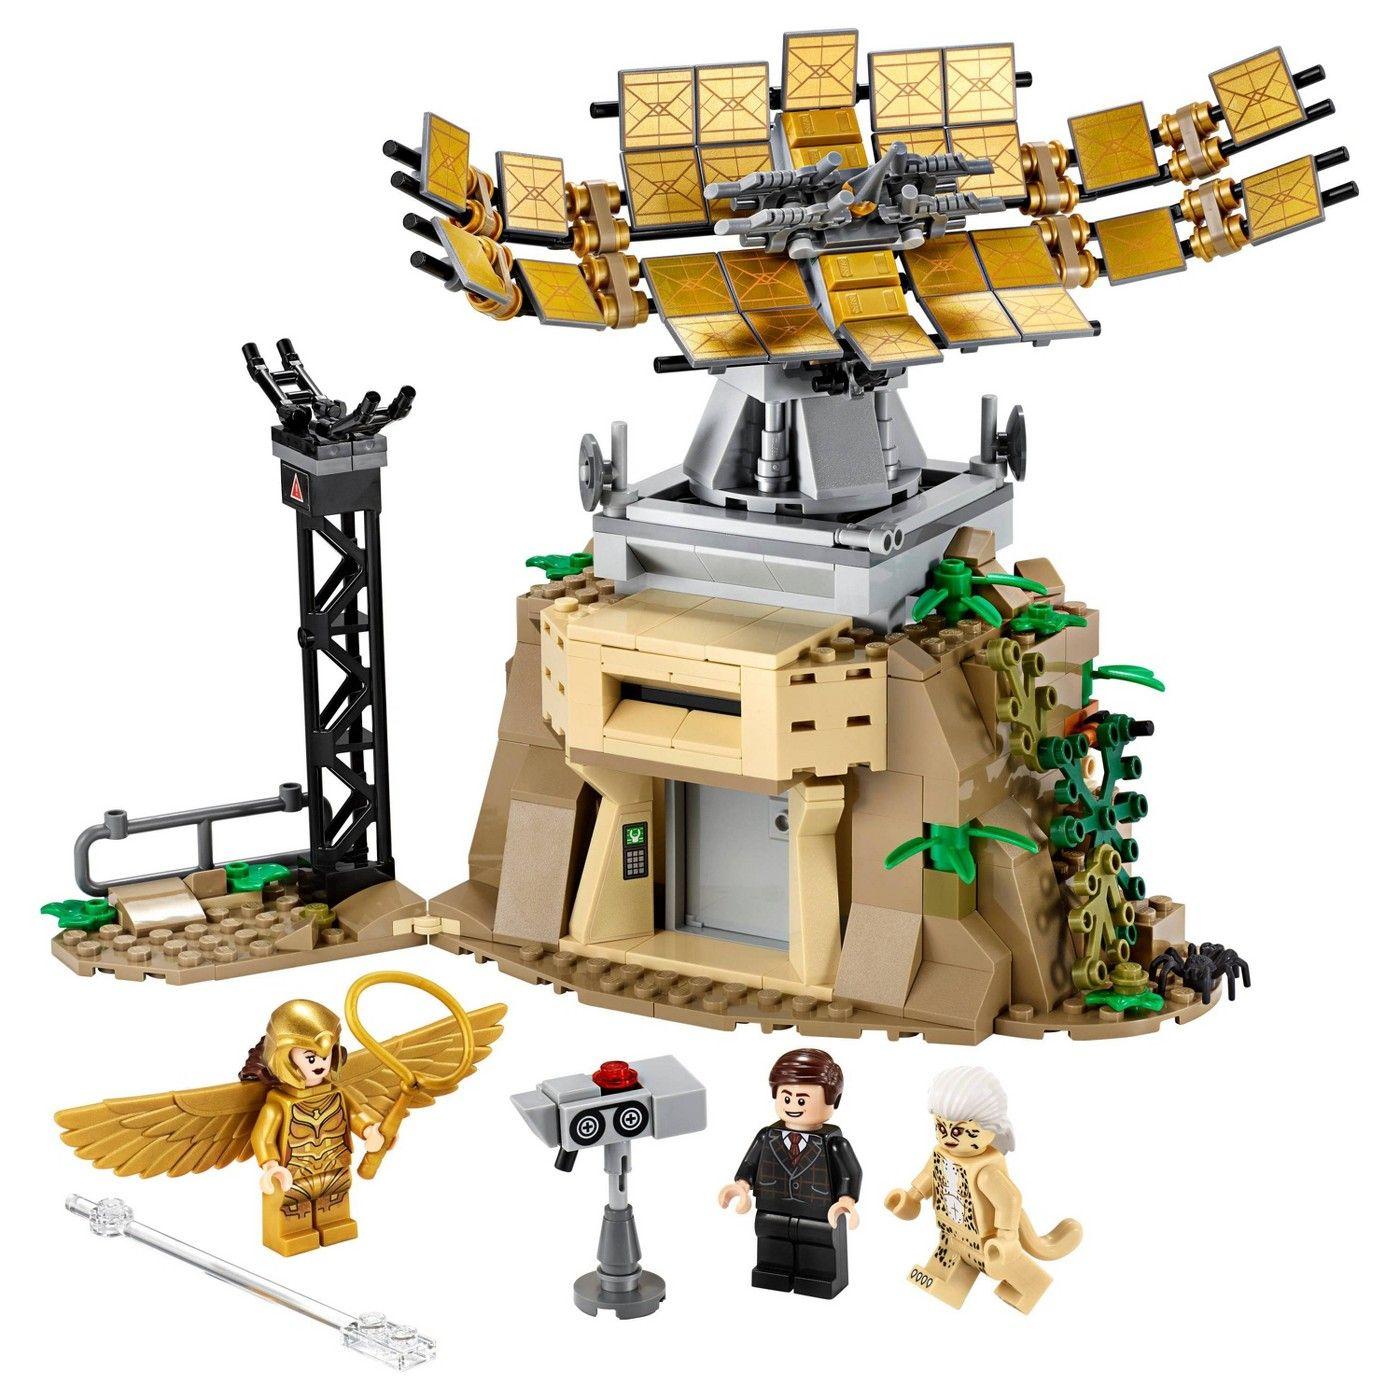 Lego Dc Wonder Woman Vs Cheetah Building Kit 76157 In 2020 Wonder Woman Vs Cheetah Lego Wonder Woman Lego Dc